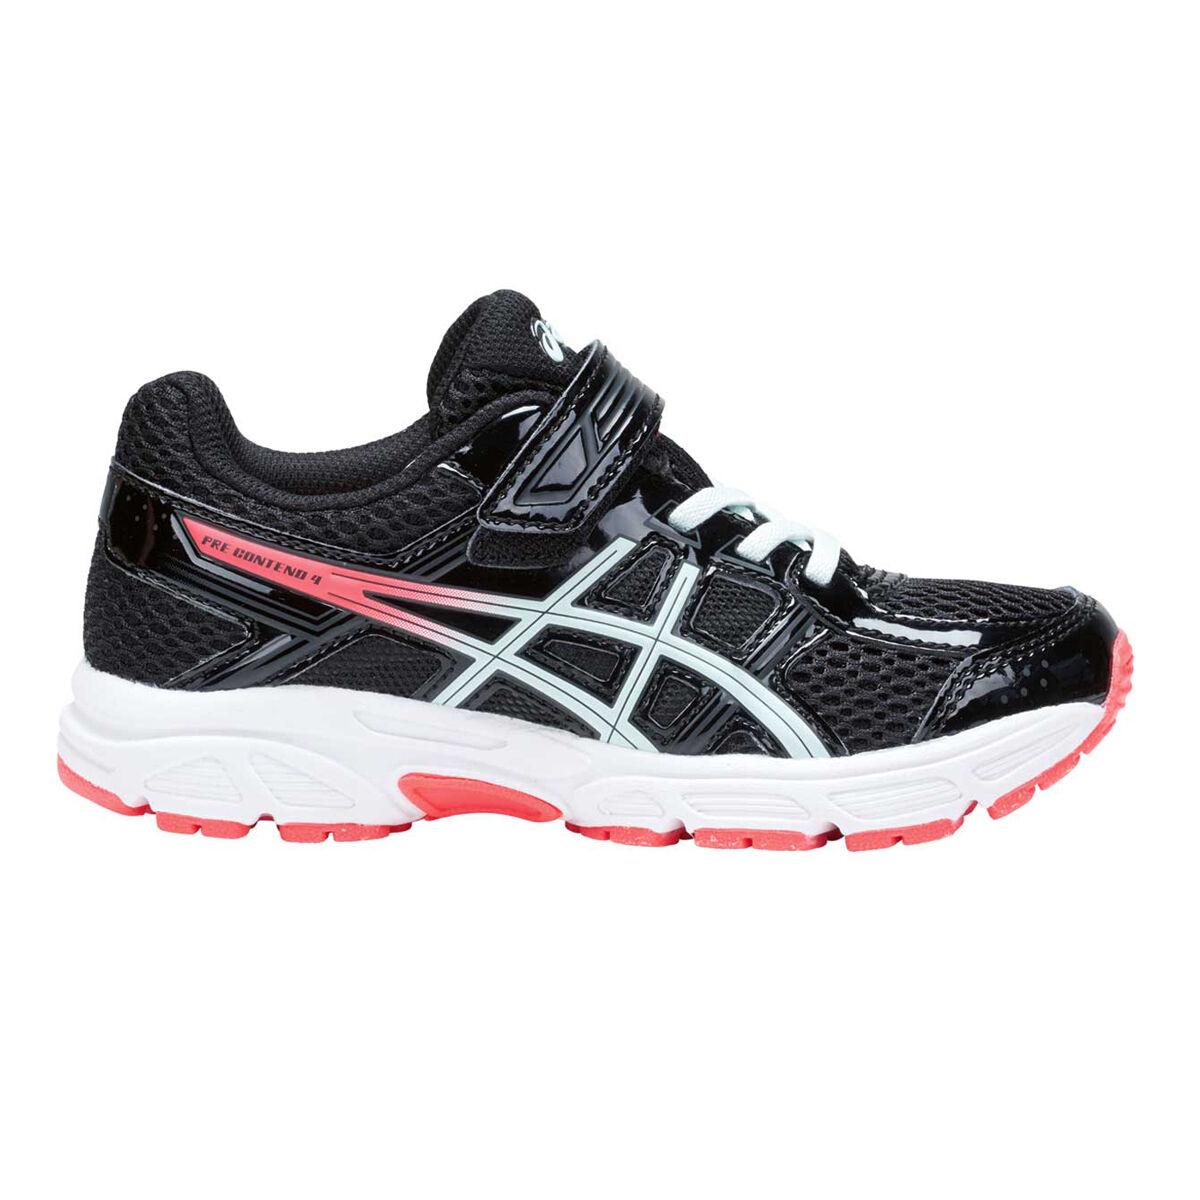 asics junior running shoes sale new zealand girl